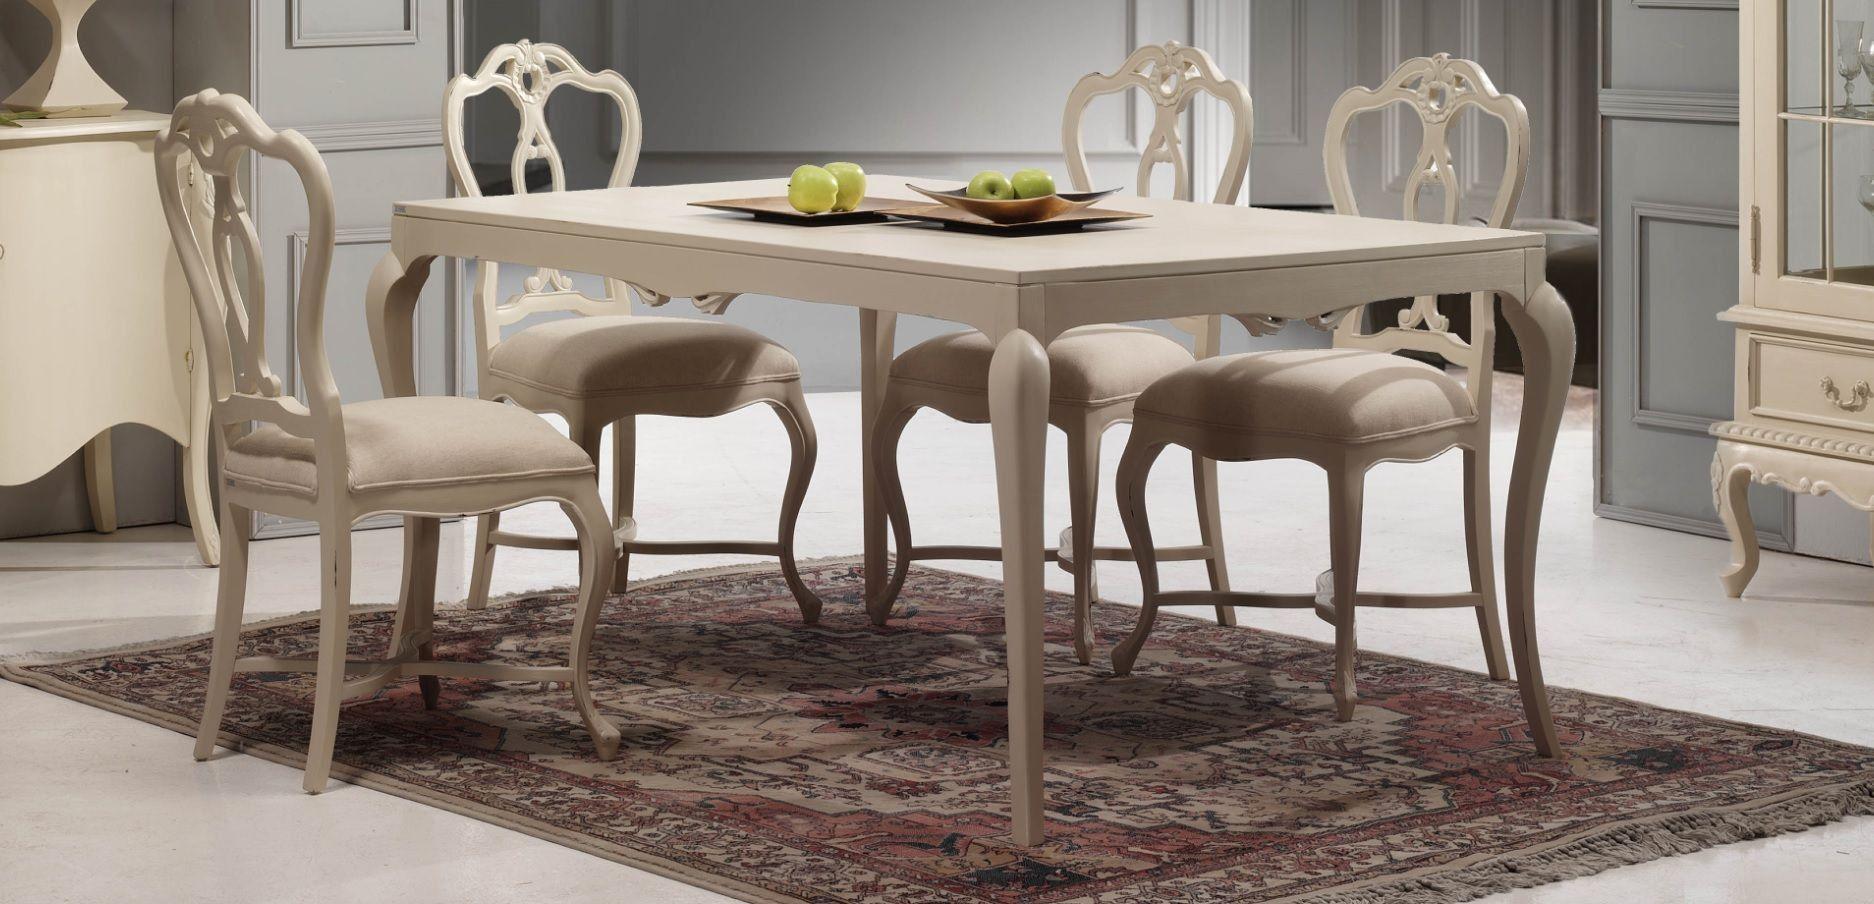 Mesa de Comedor Vintage Estambul | Meubles | Pinterest